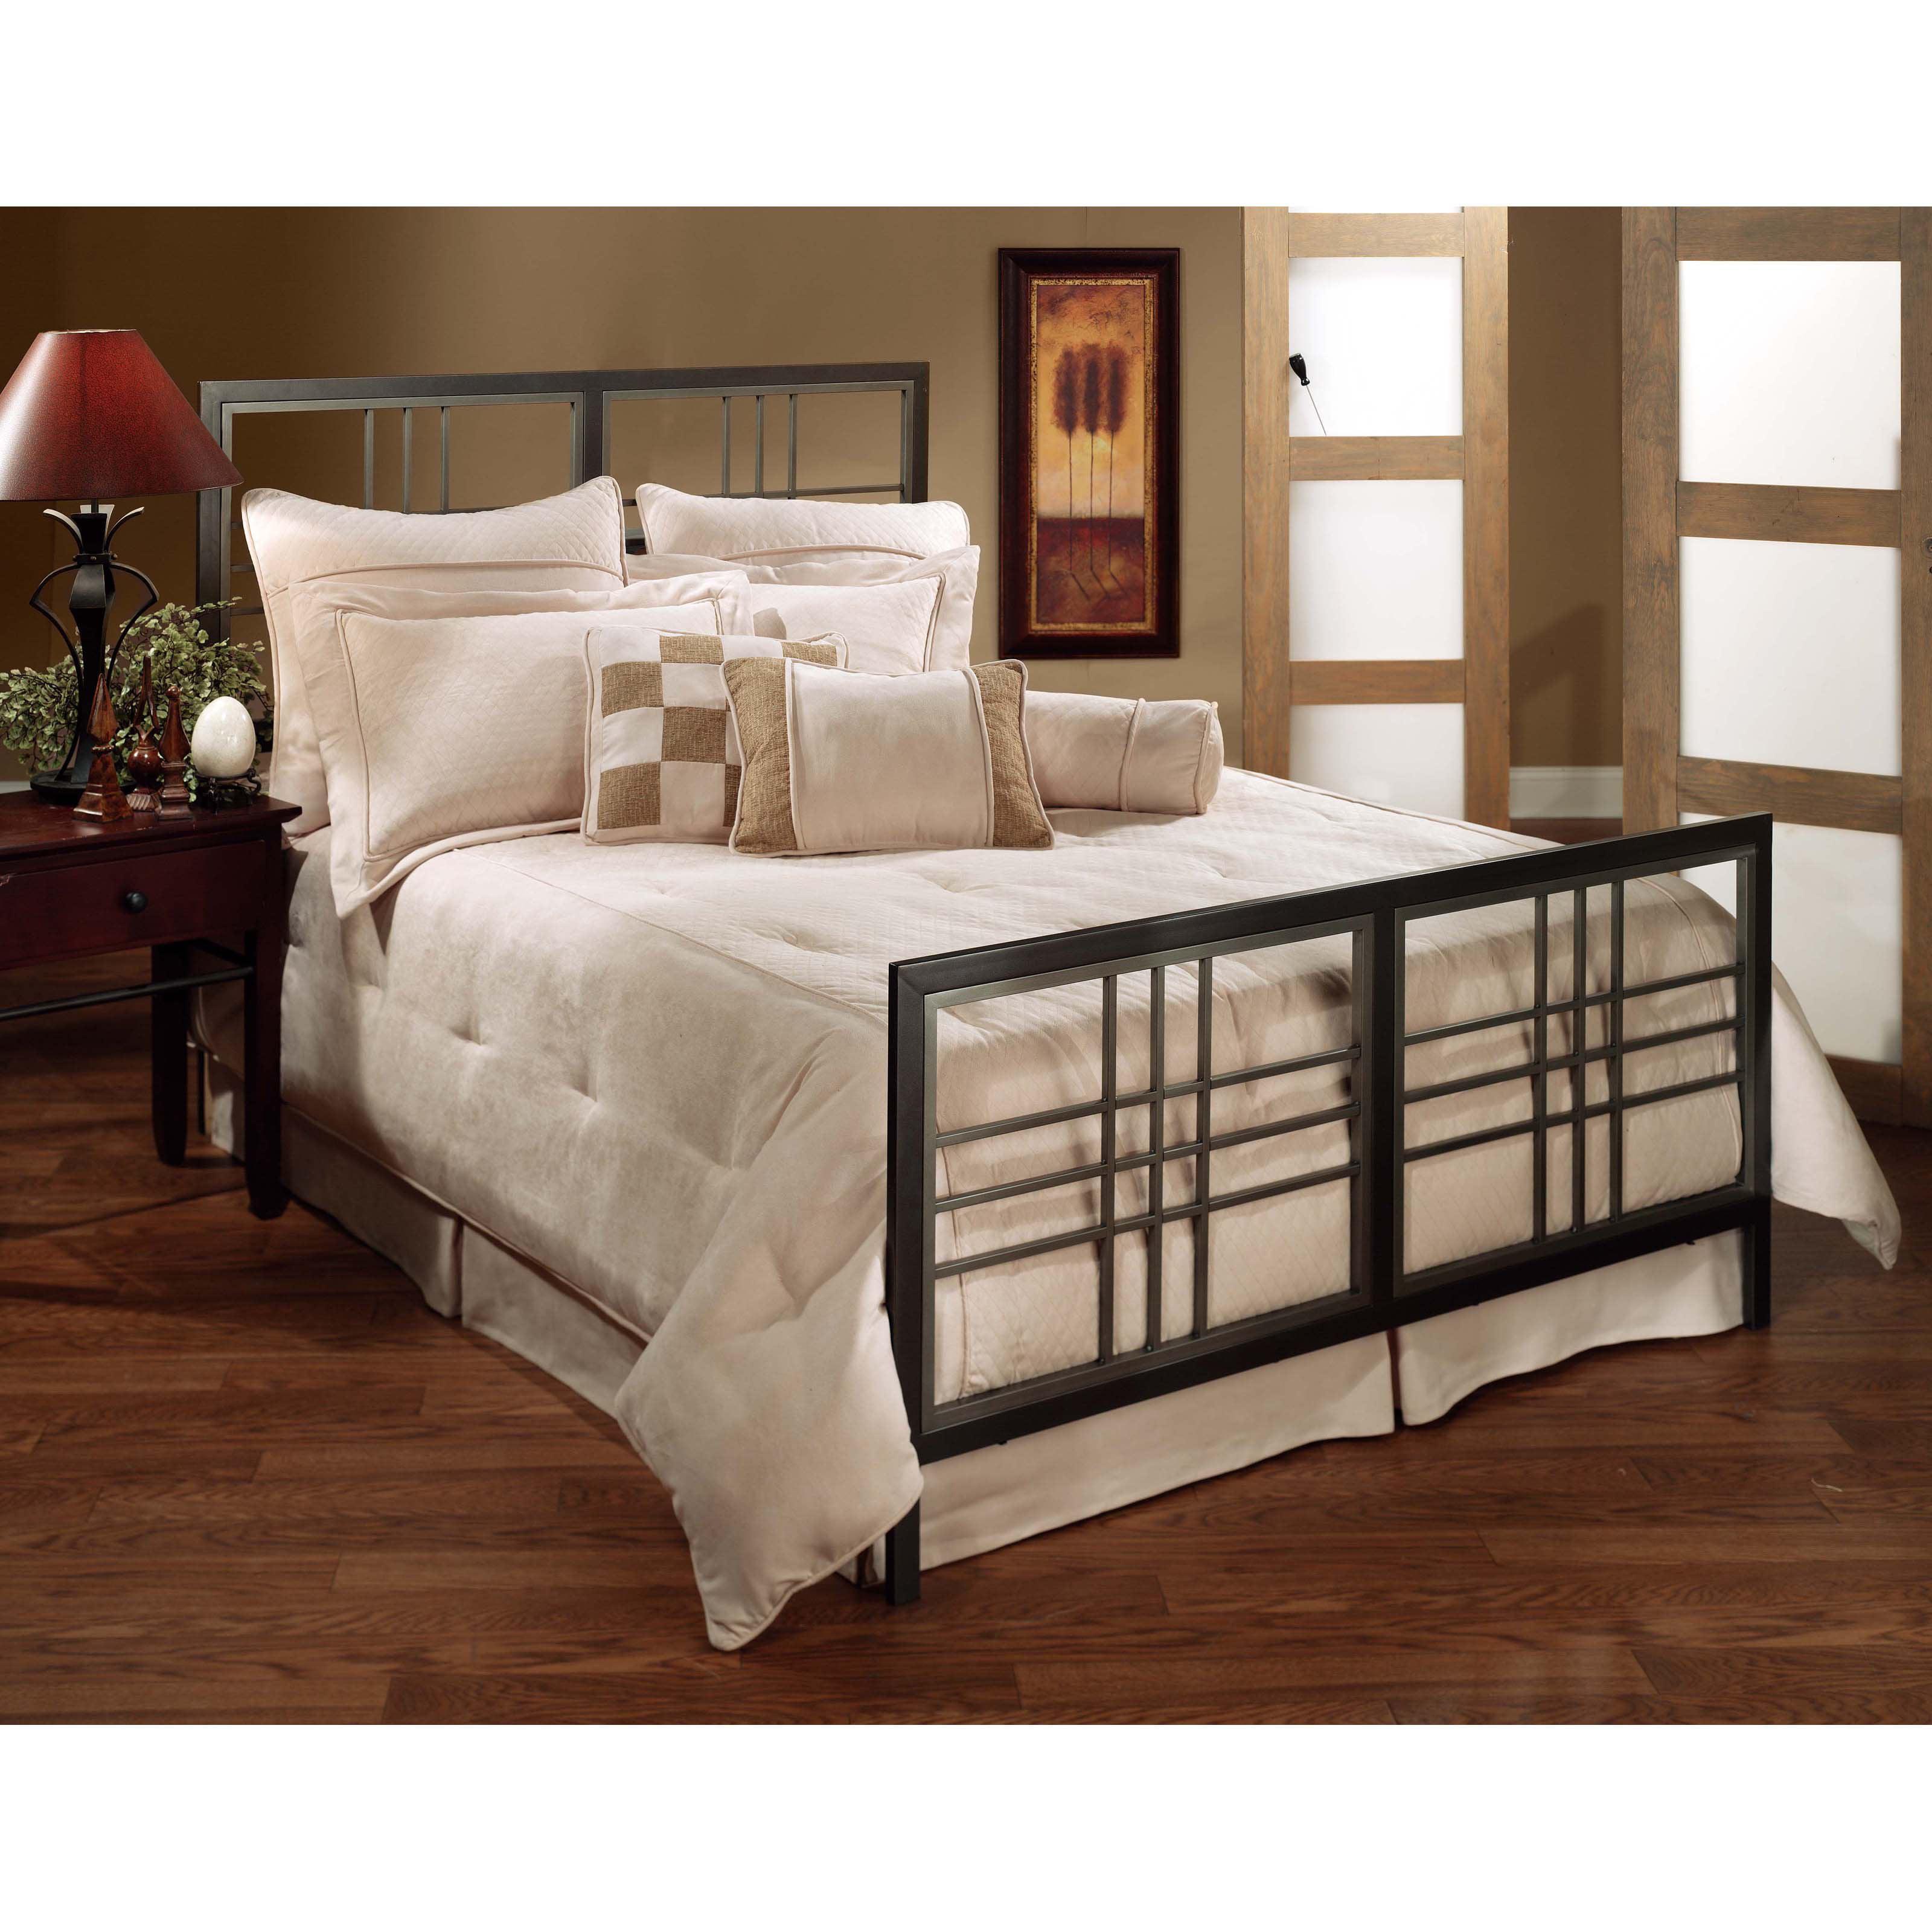 Tiburon Bed